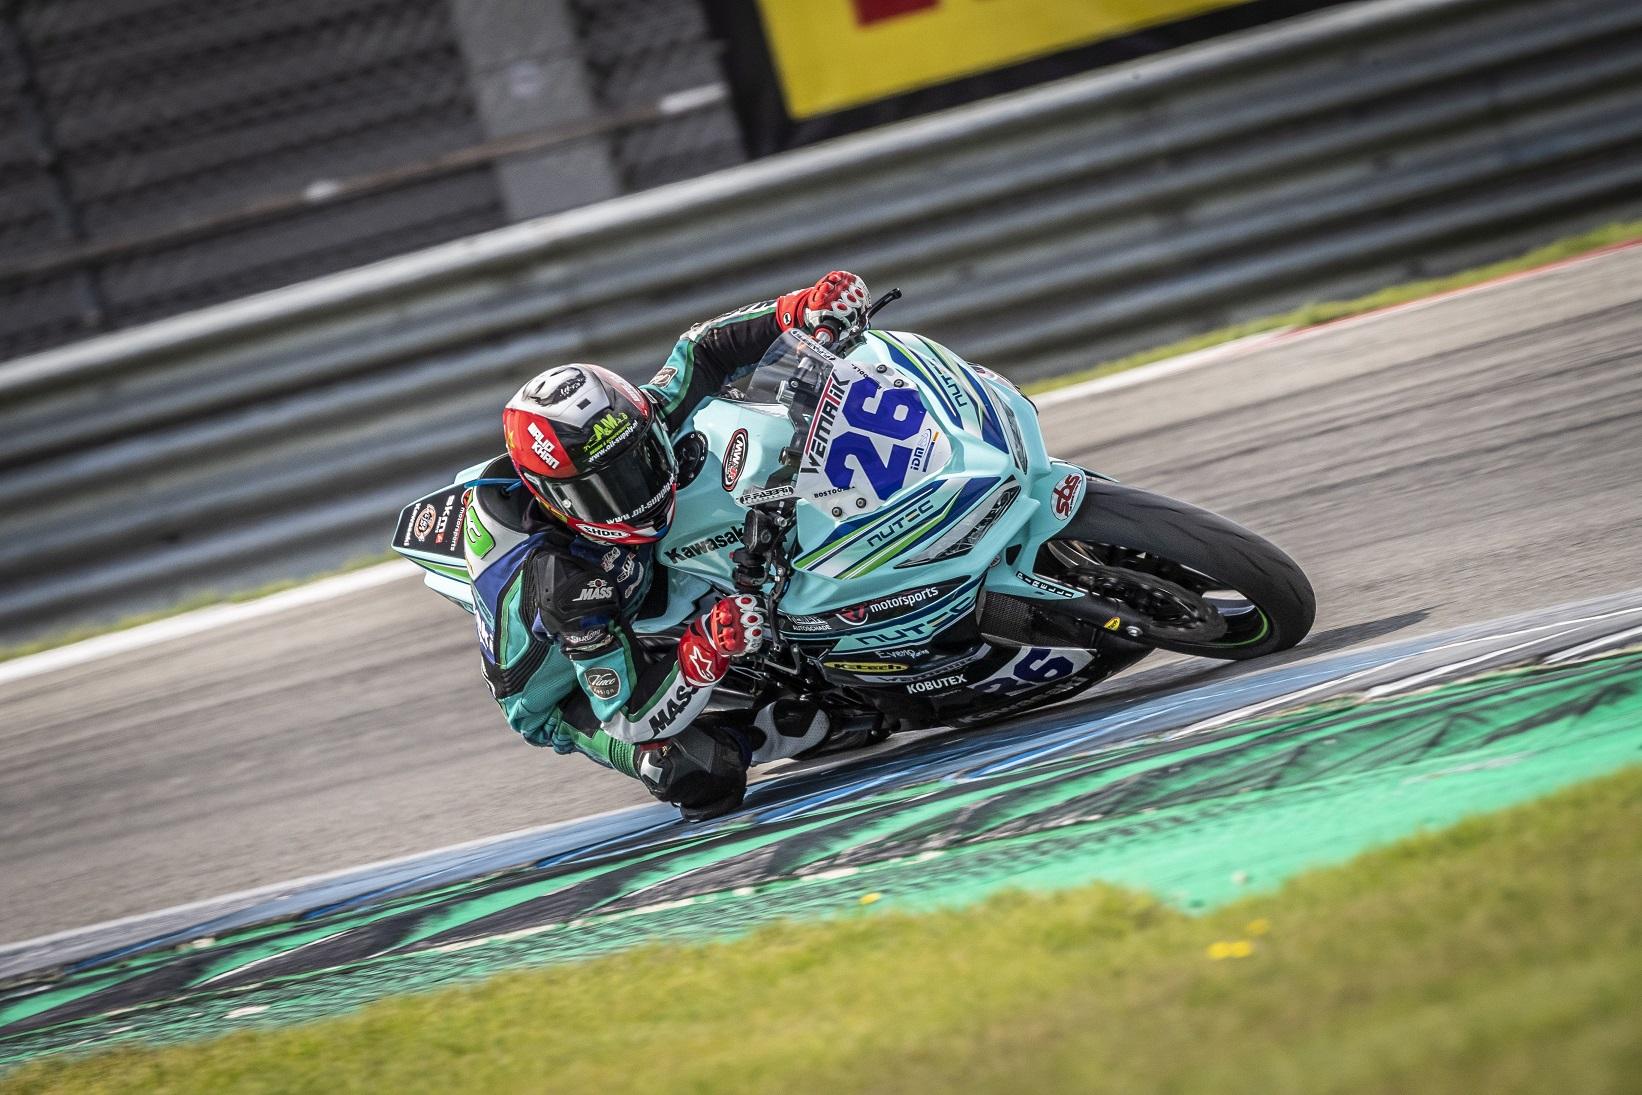 IDM Supersport 300: Kawasaki-Pilot Licciardi baut Spitzenposition aus